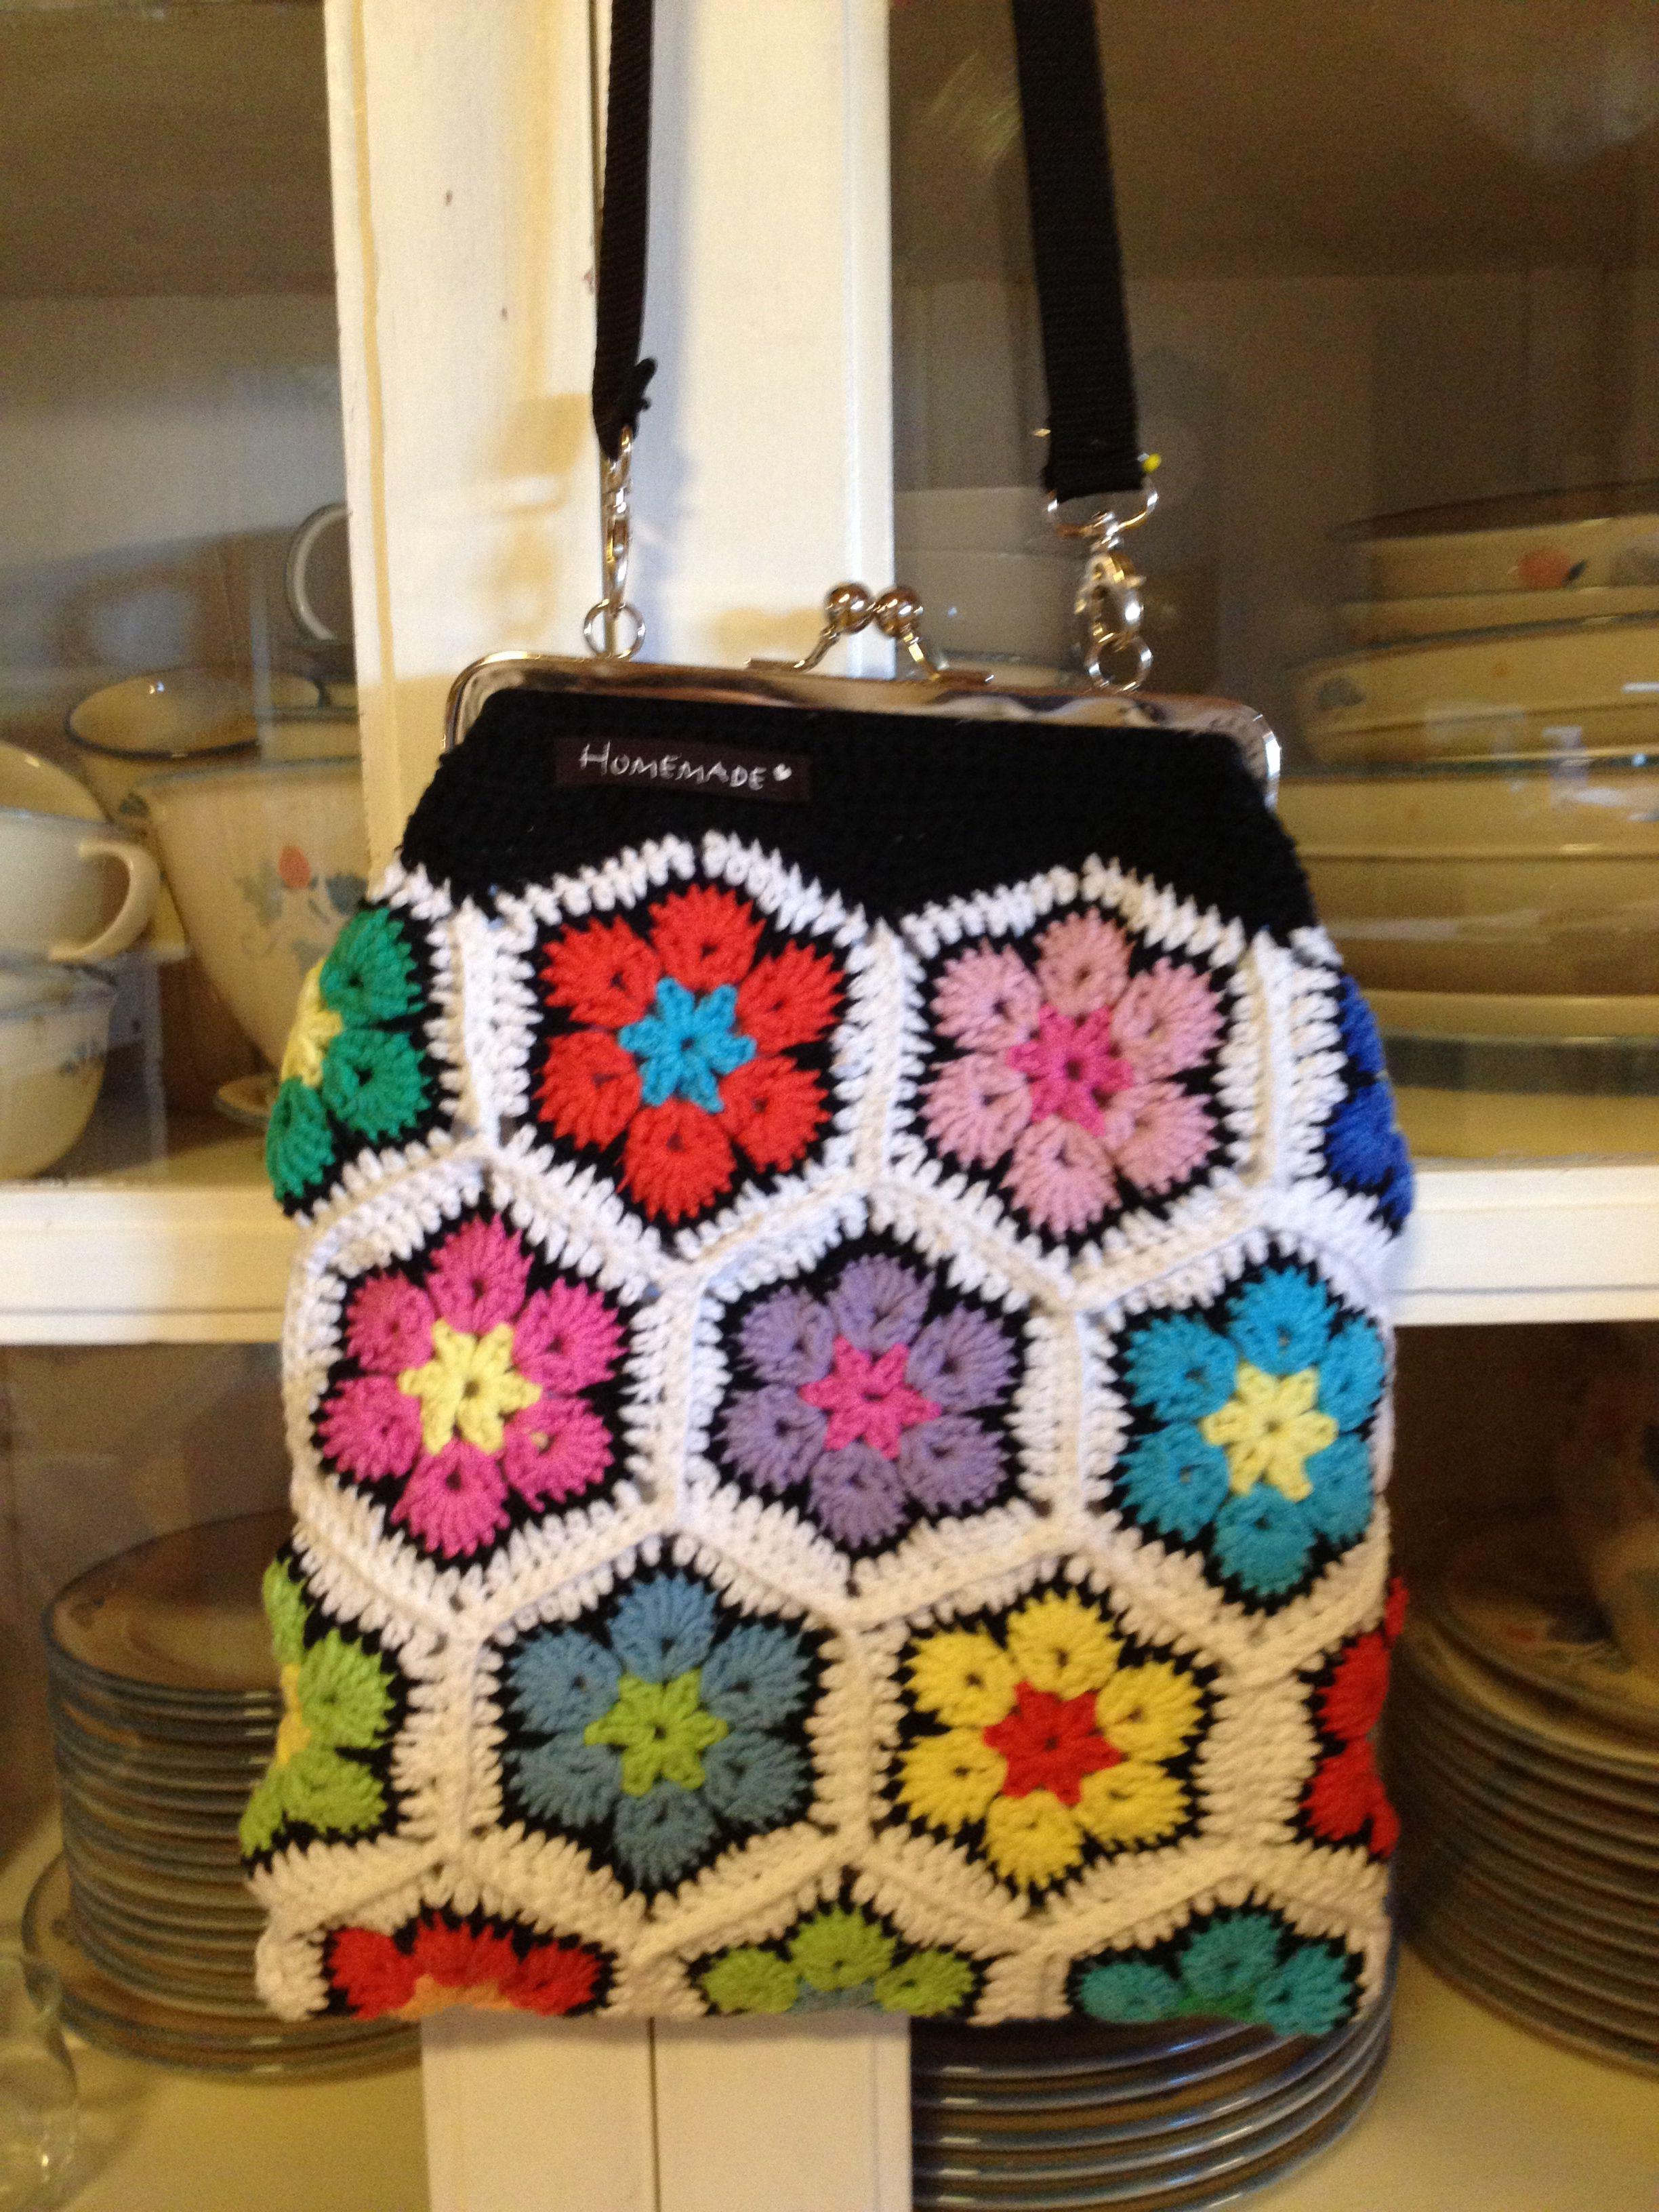 Kevät riemua - laukku, Afrikankukka virkkaus handmade Tanja Suomela